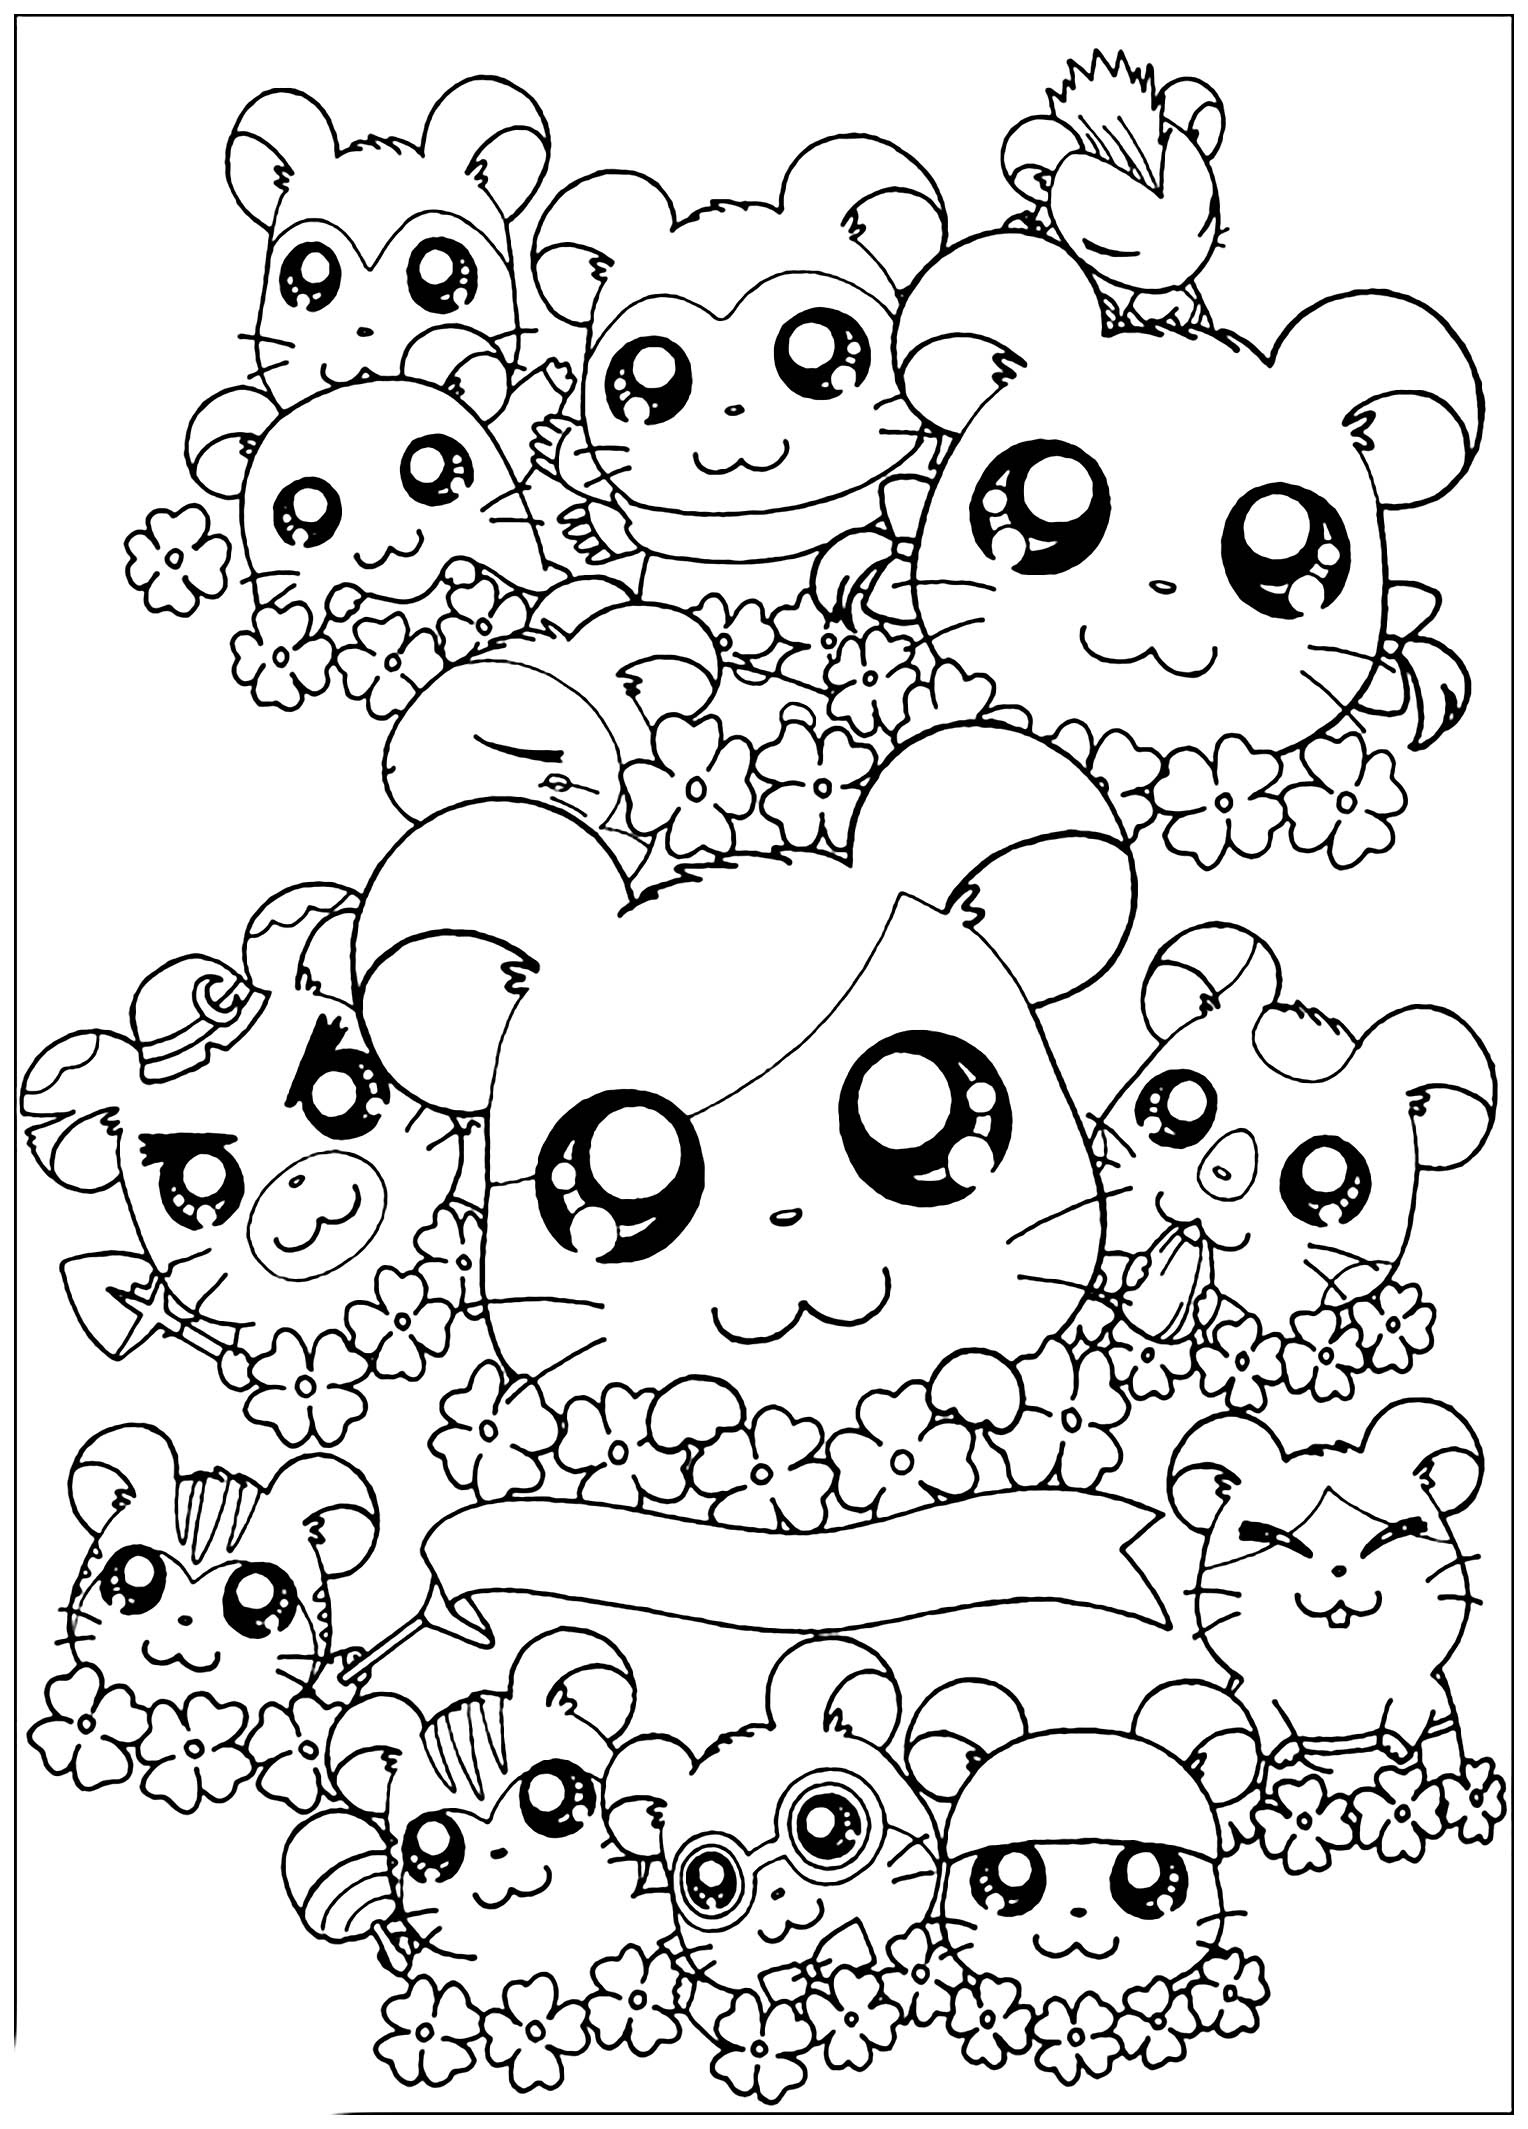 Coloriage Kawaii Disney Bestof Images Colorage Hamtoro à Coloriage Kawaii A Imprimer